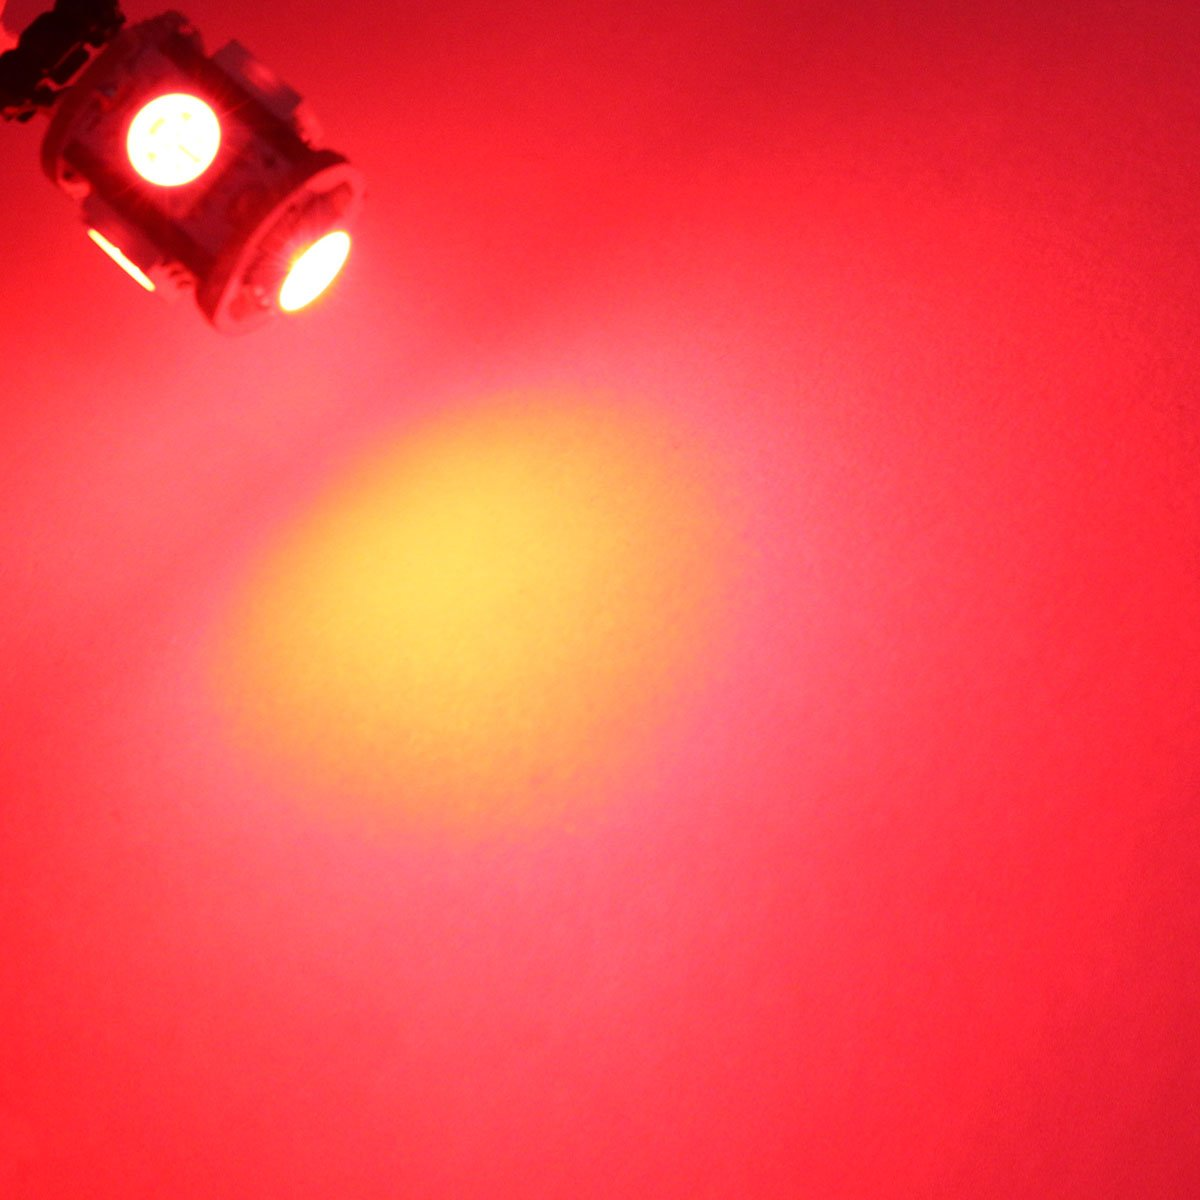 Ledingway ligting Co Ltd 4350379842 Red WeiXuan 4 PCS BA9S T4W 64111 64113 BA9 LED Car Interior Bulbs Map Reading Parking Light